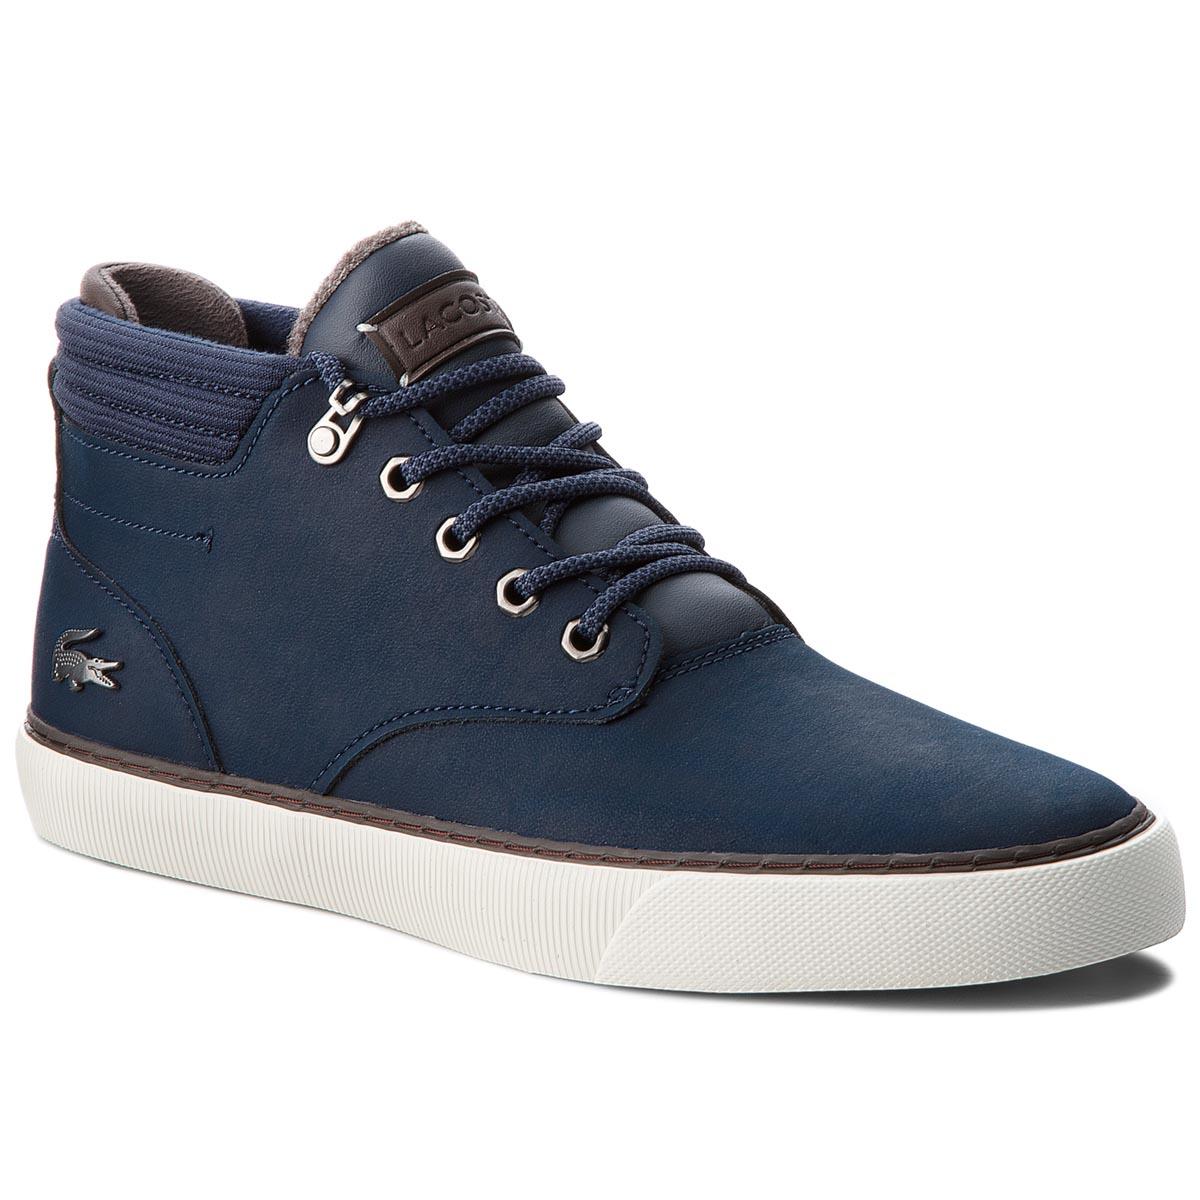 acc1b7c4a Sneakers LACOSTE Esparre Winter C 318 3 Cam 7-36CAM00222Q8 Nvy Brw